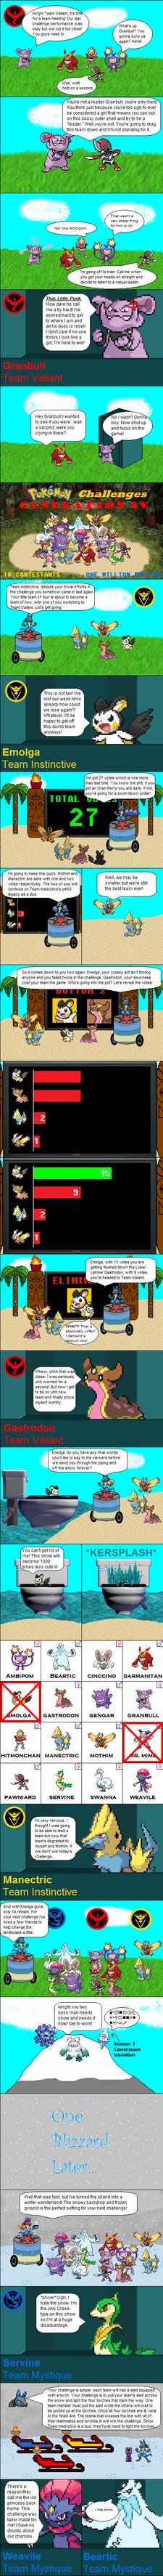 Pokemon Challenges Gen IV Ep 3 - Part 1 by pokemonmanic3595